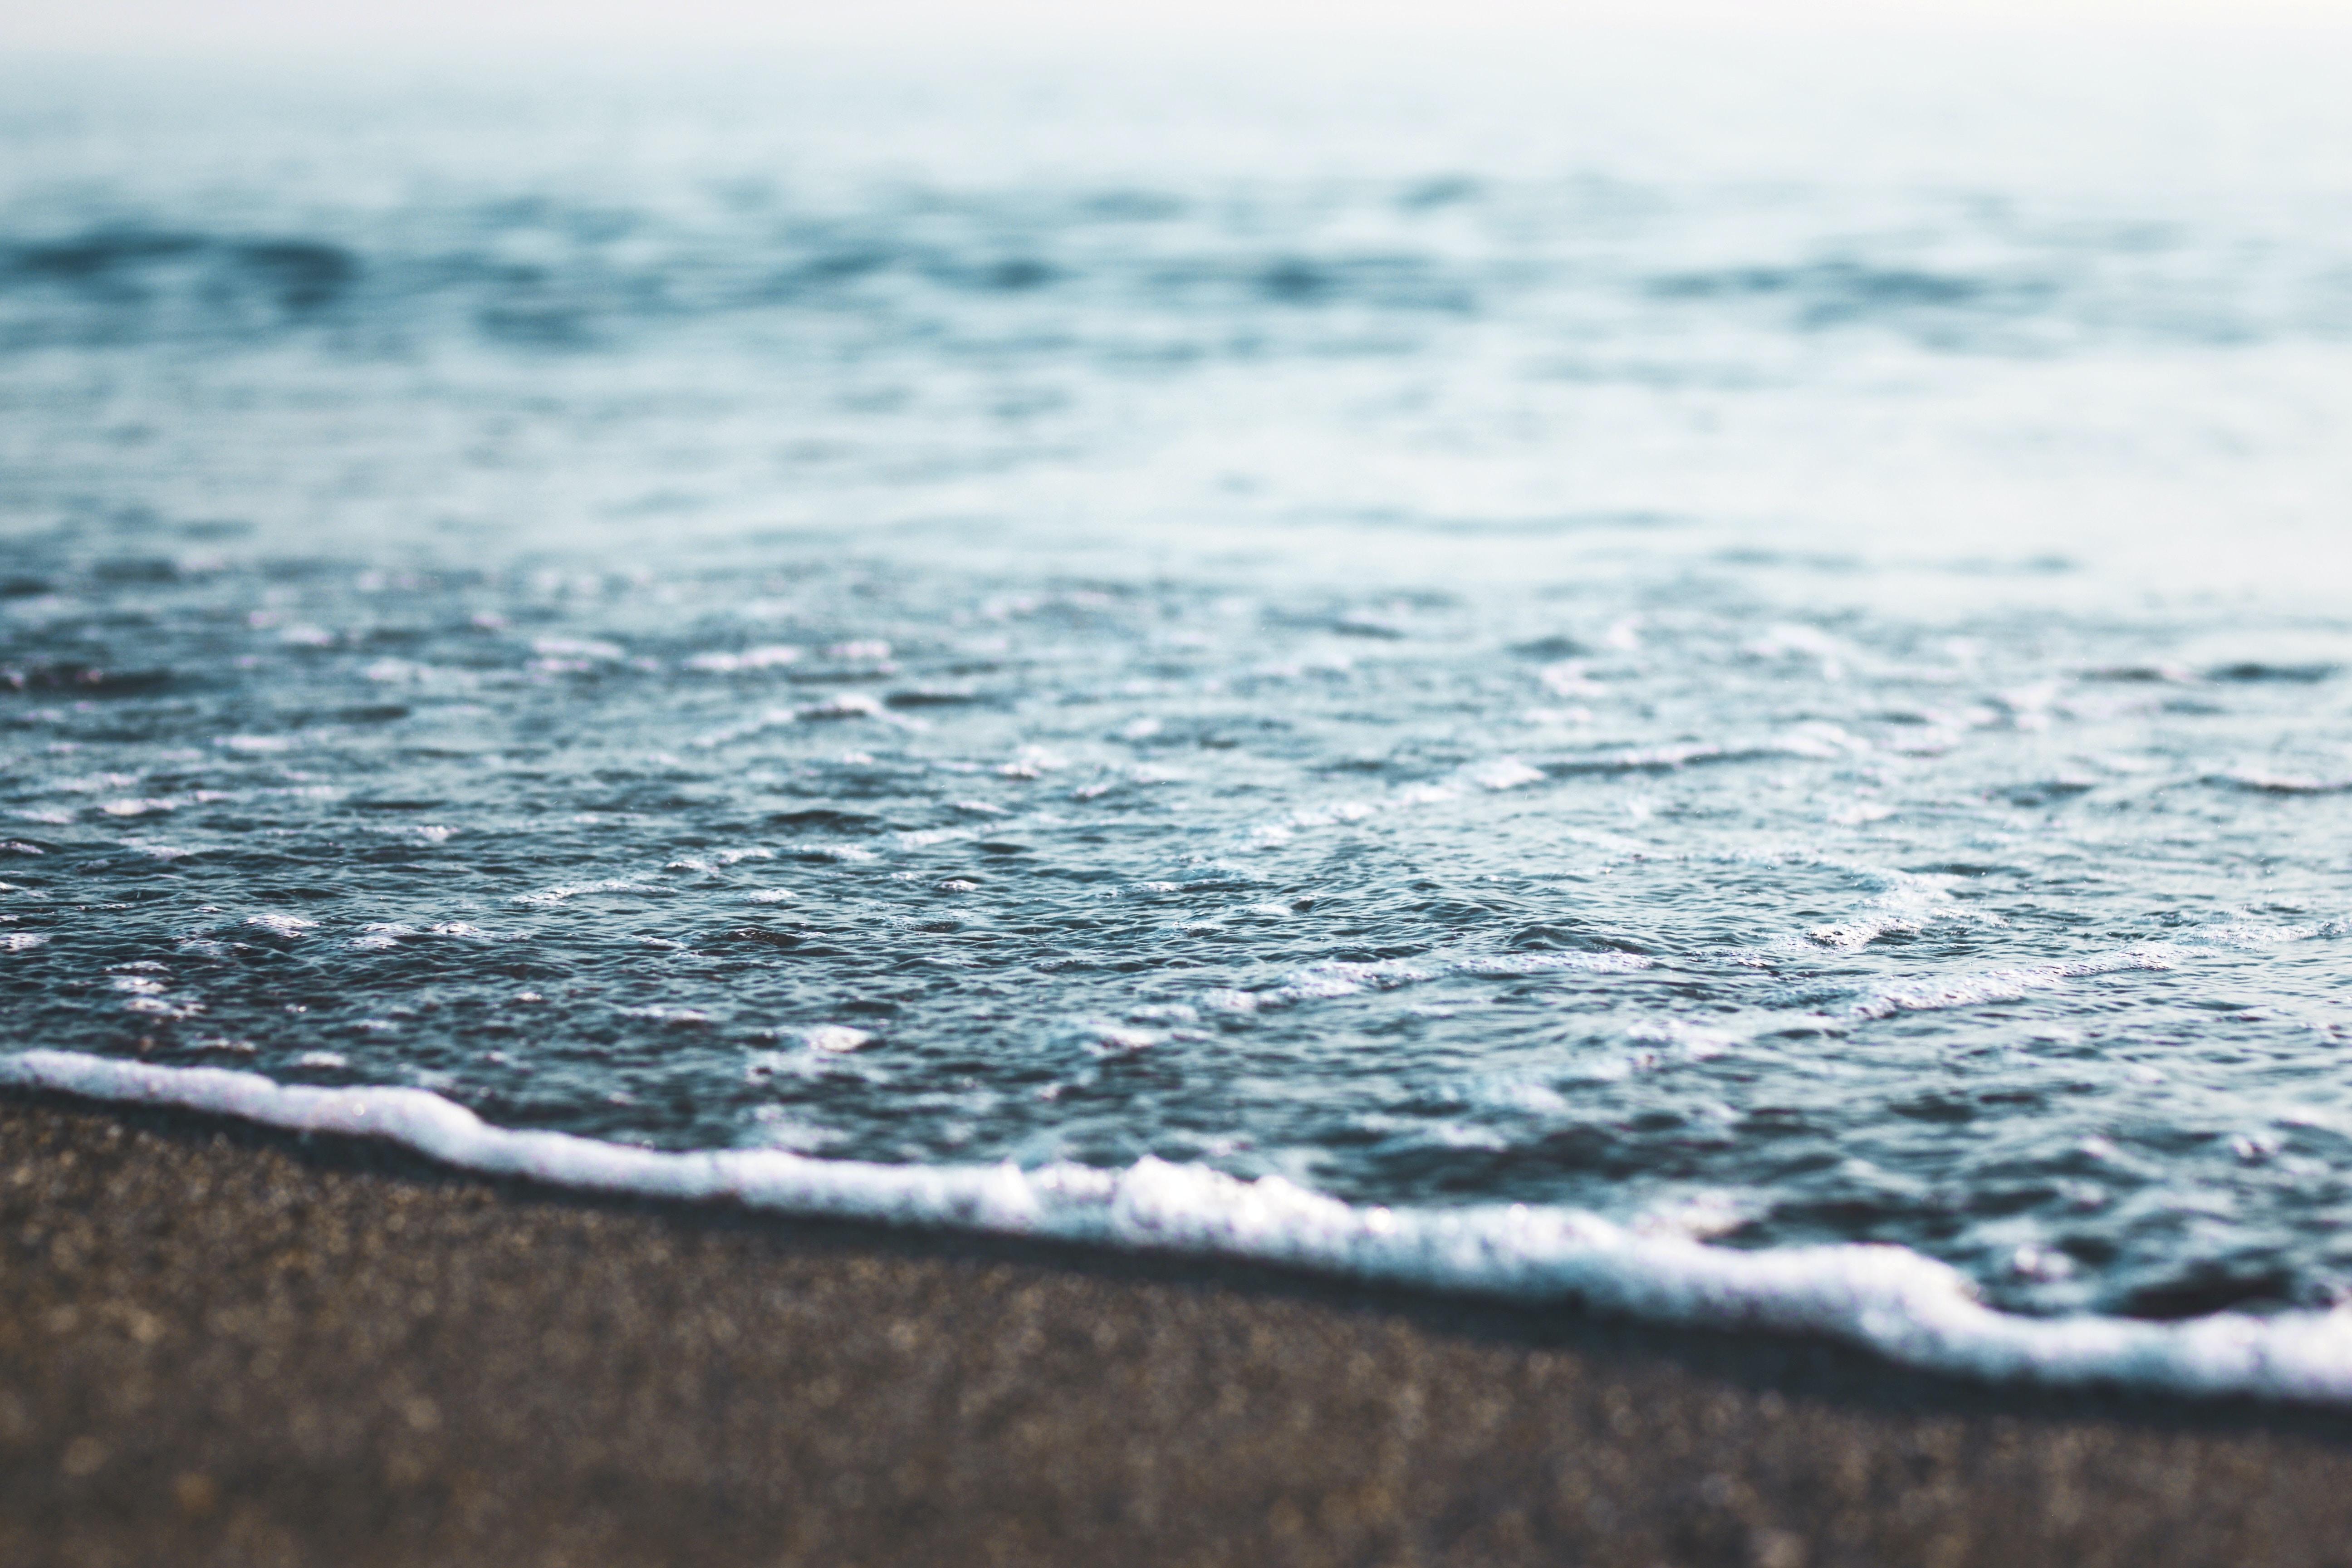 sea waves touches seashore at daytime